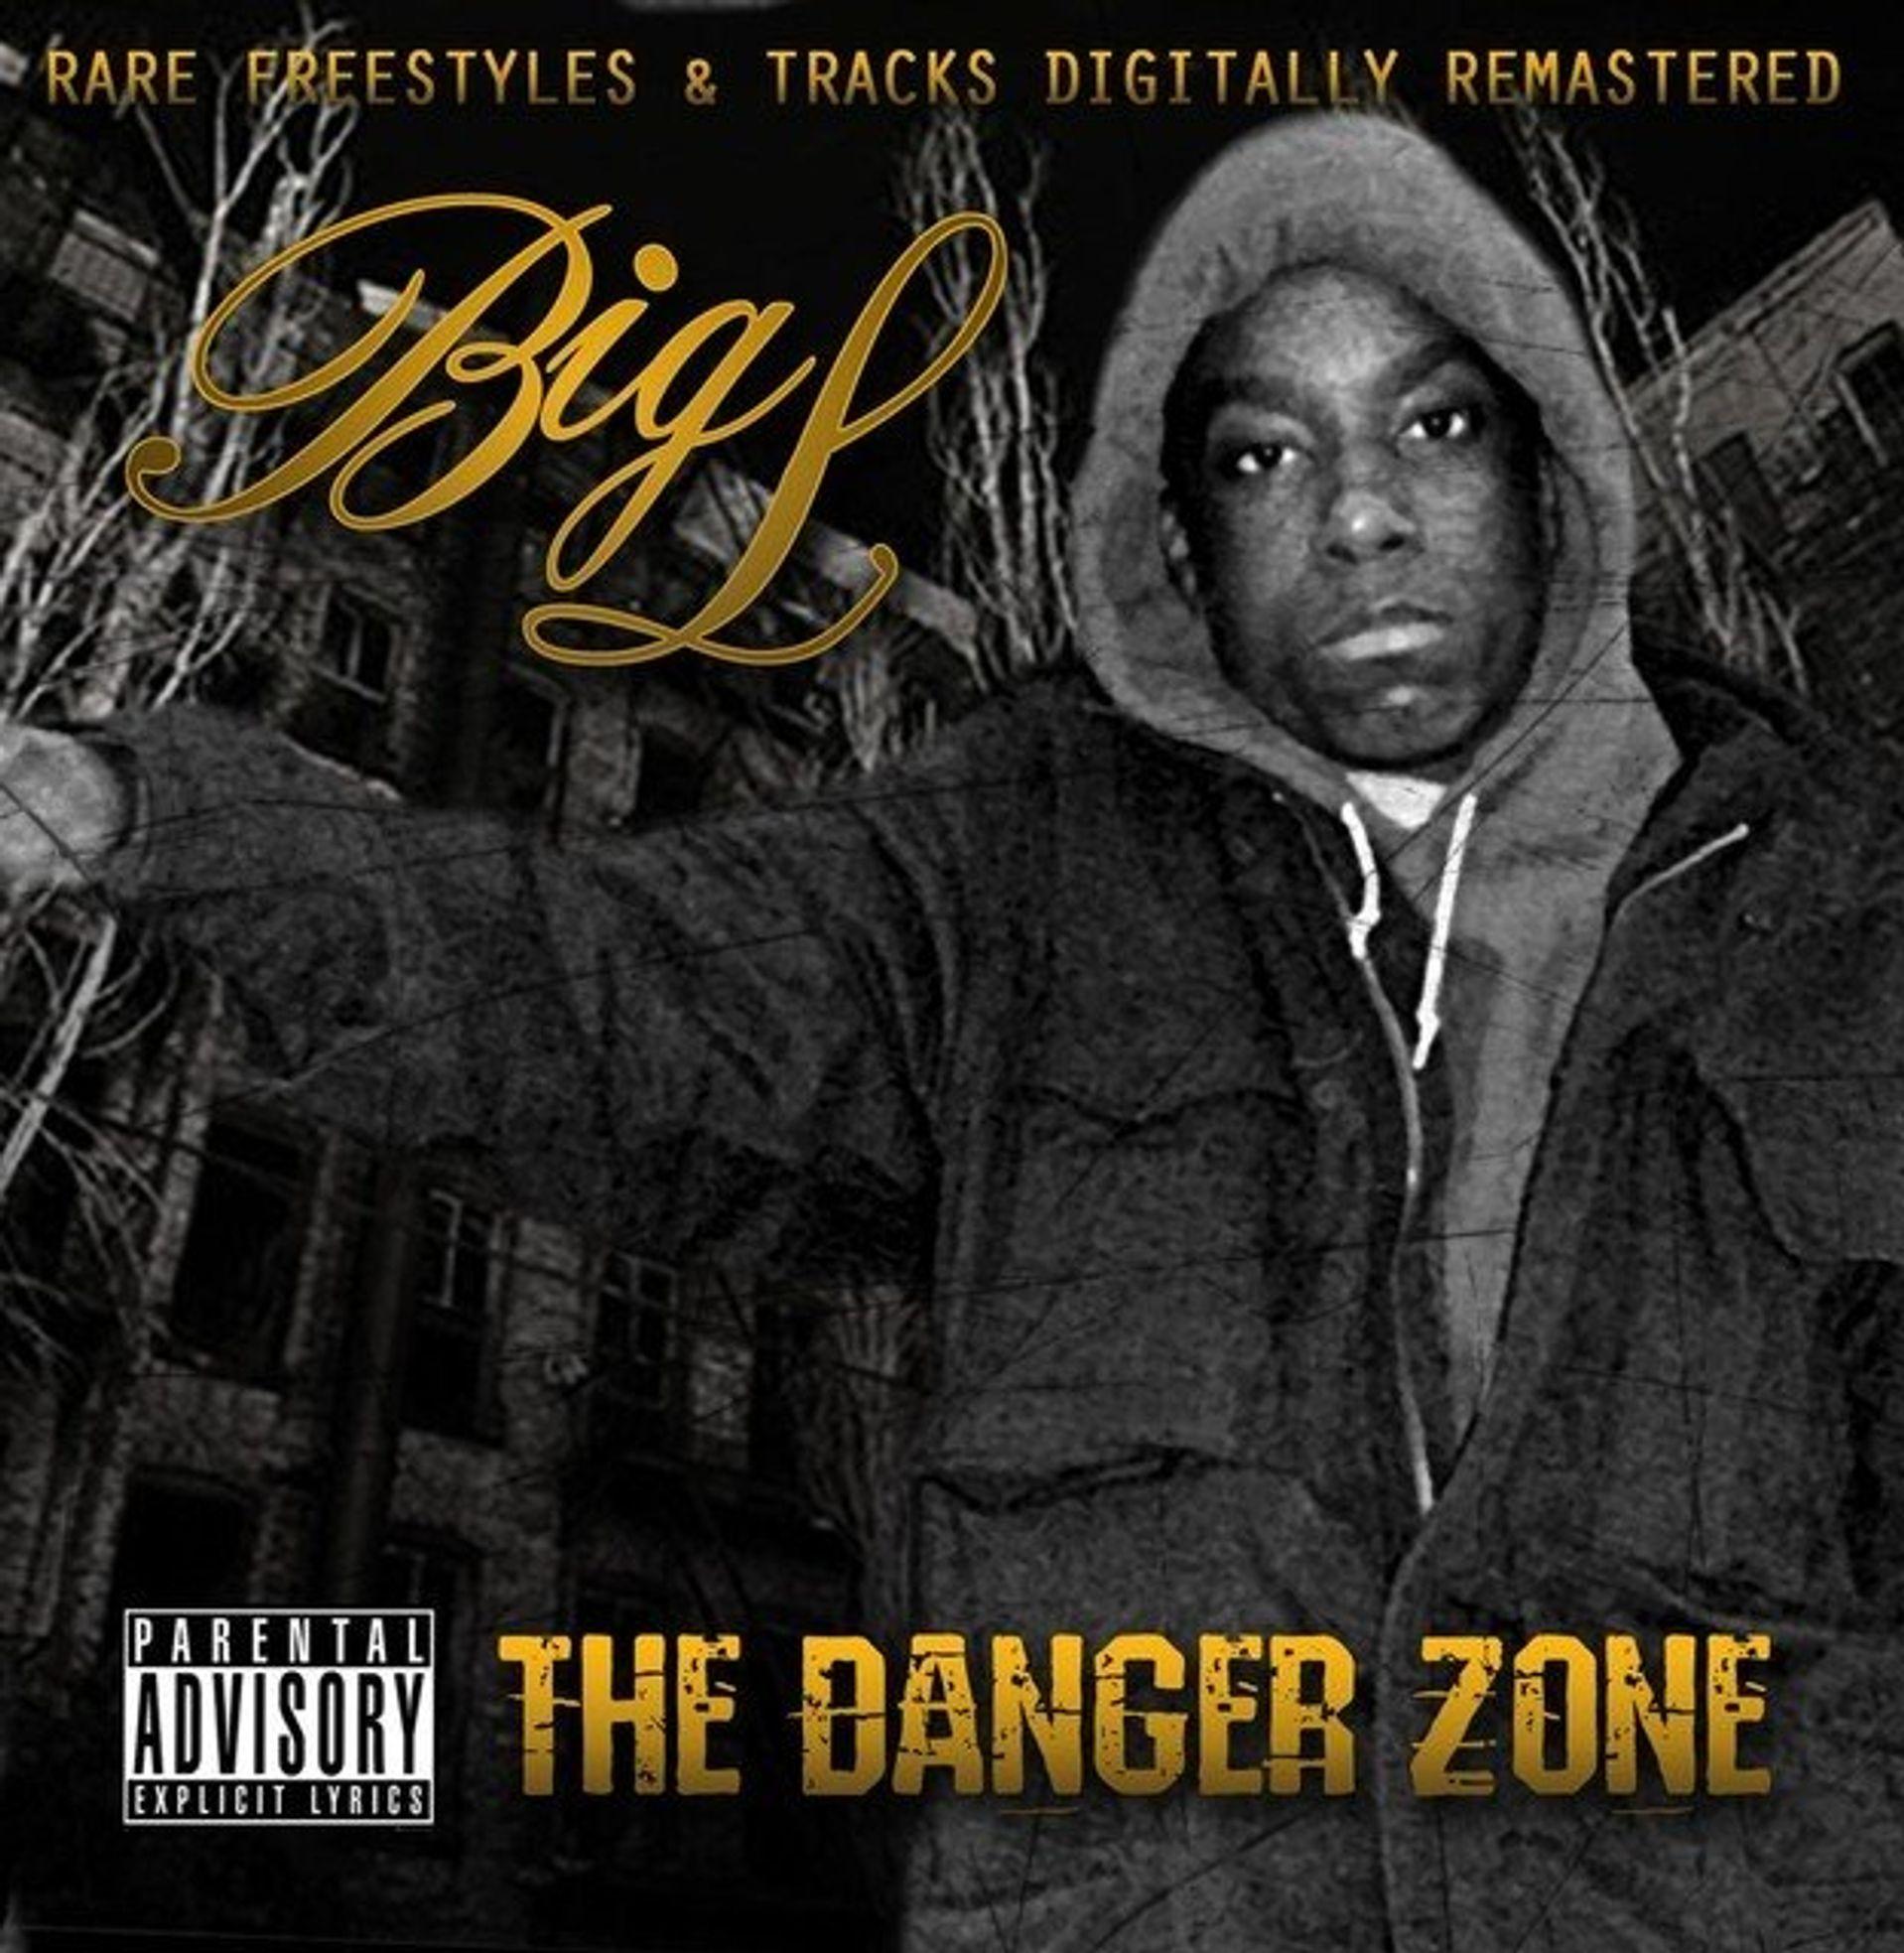 Album Title: The Danger Zone by: Big L